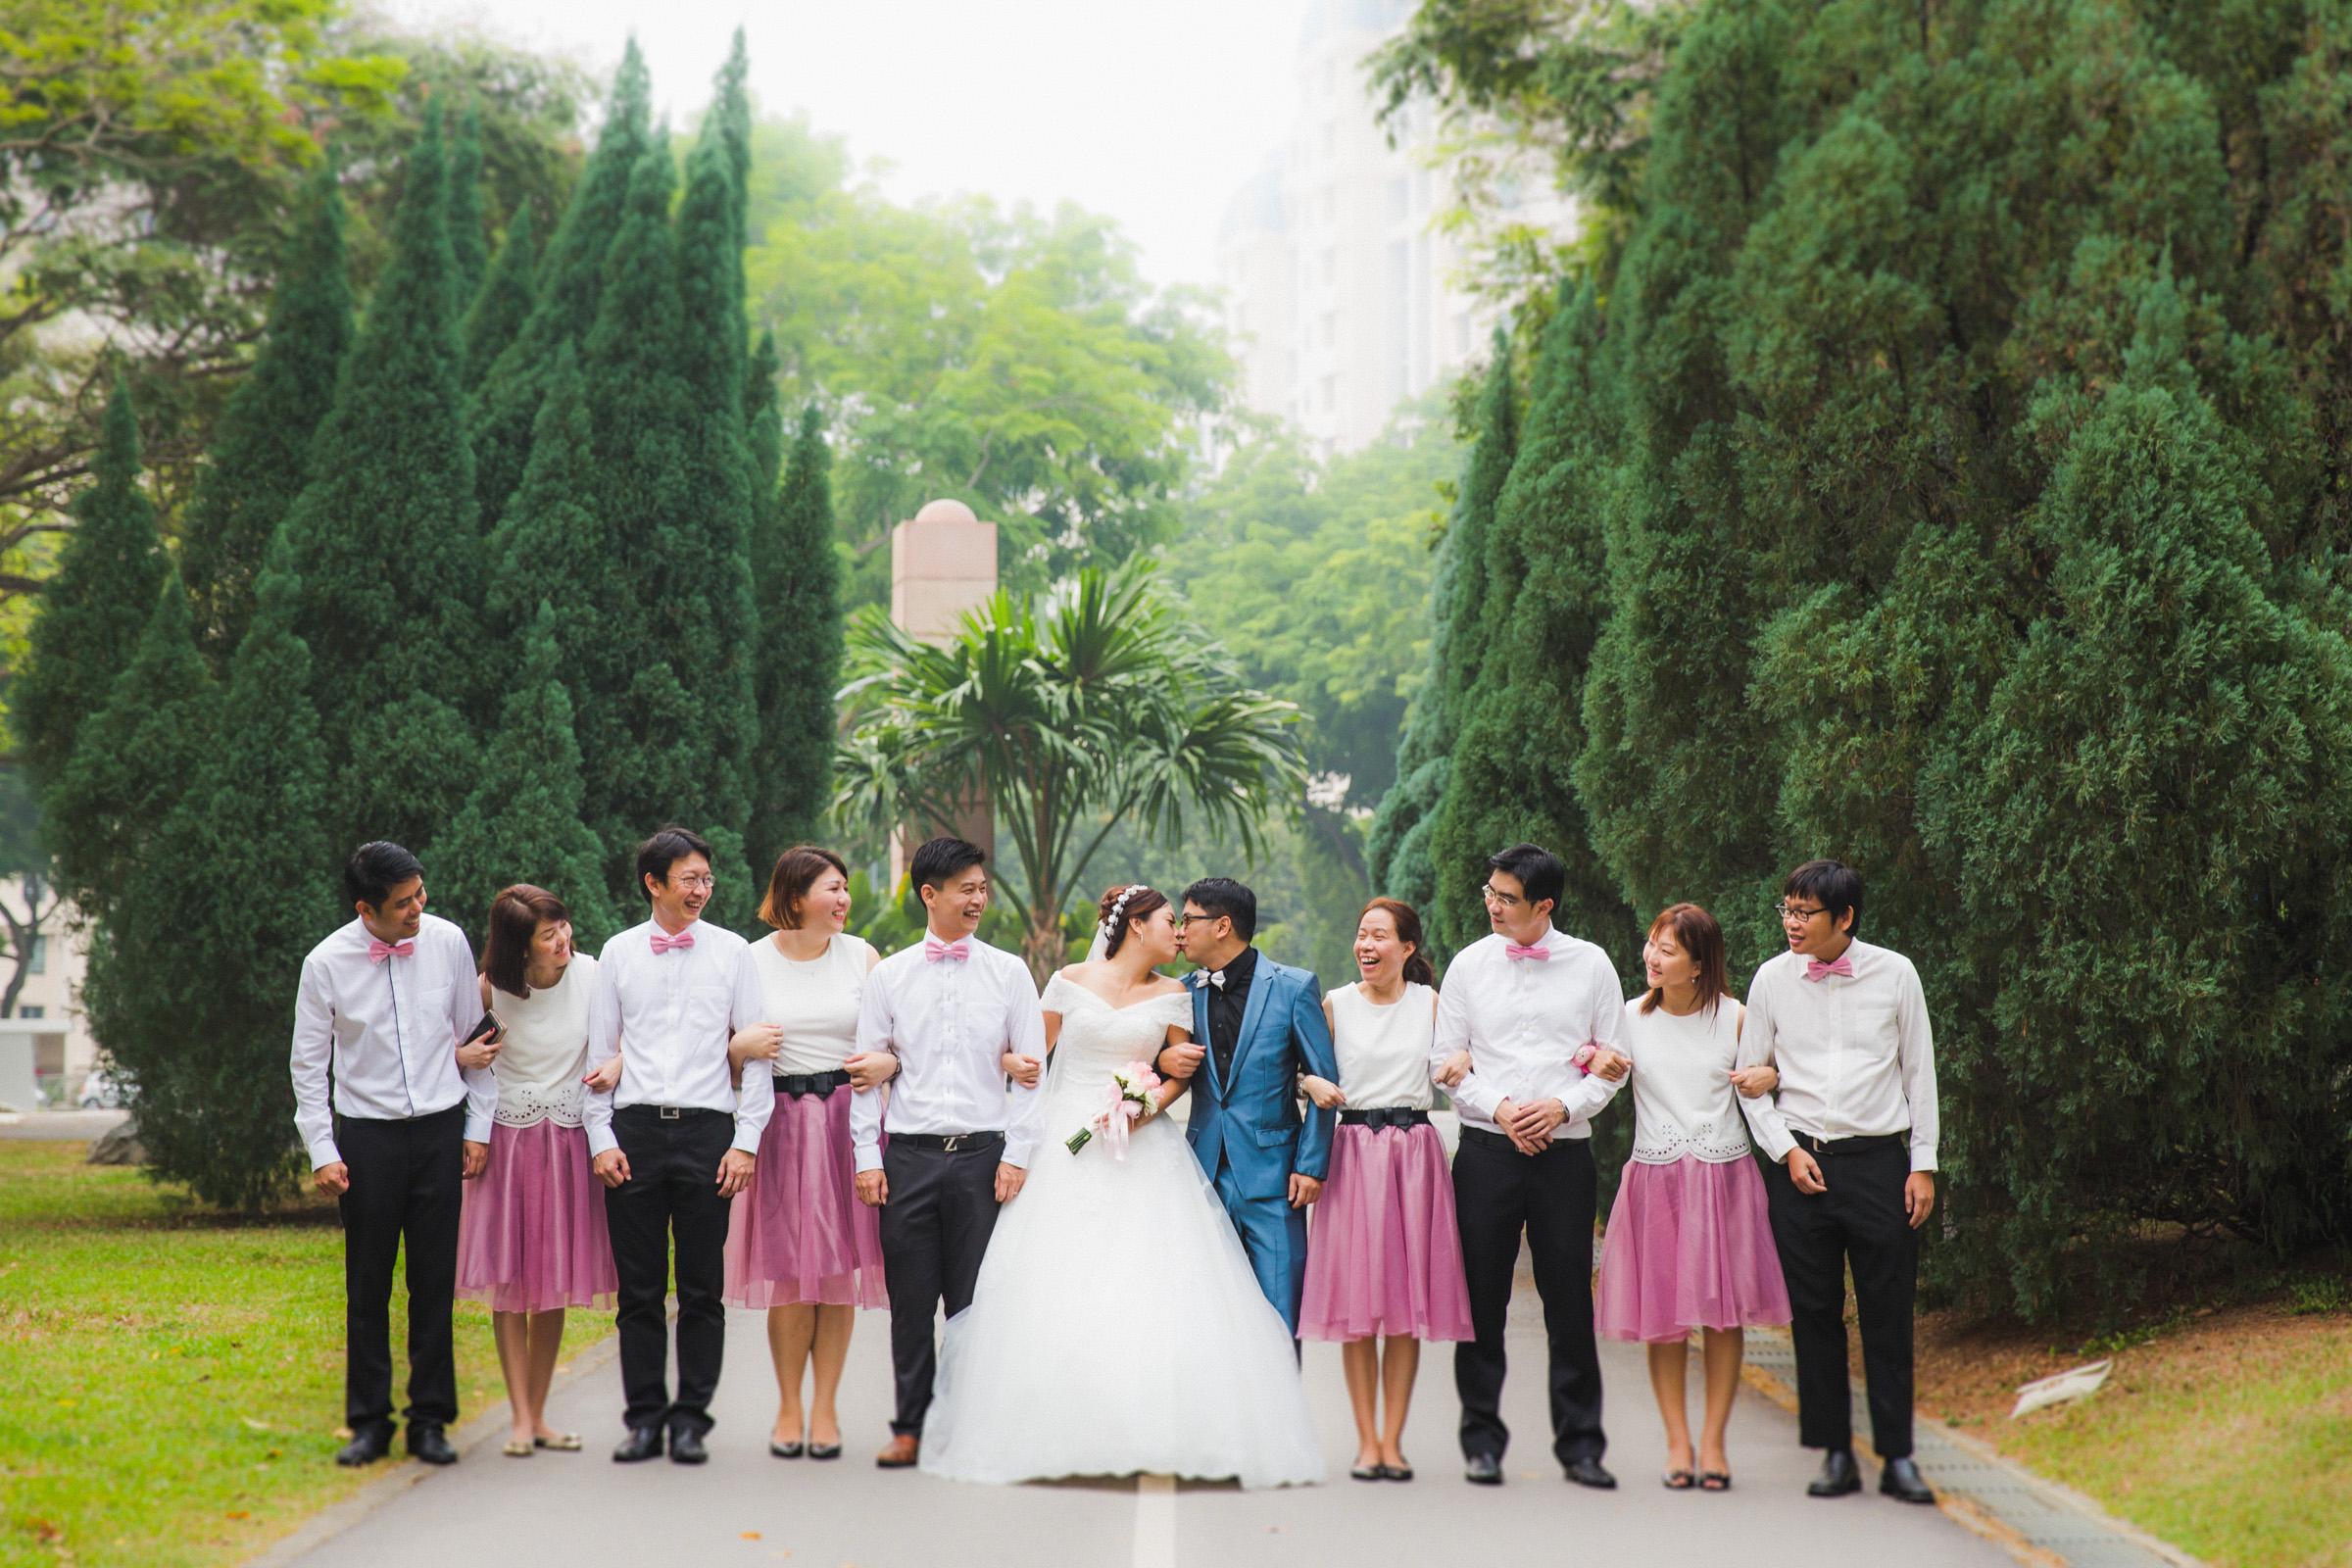 Steven_Jasmine_Wedding_Walldrobe Photography_Wedding shoots_Actual day wedding_Photographer (19)